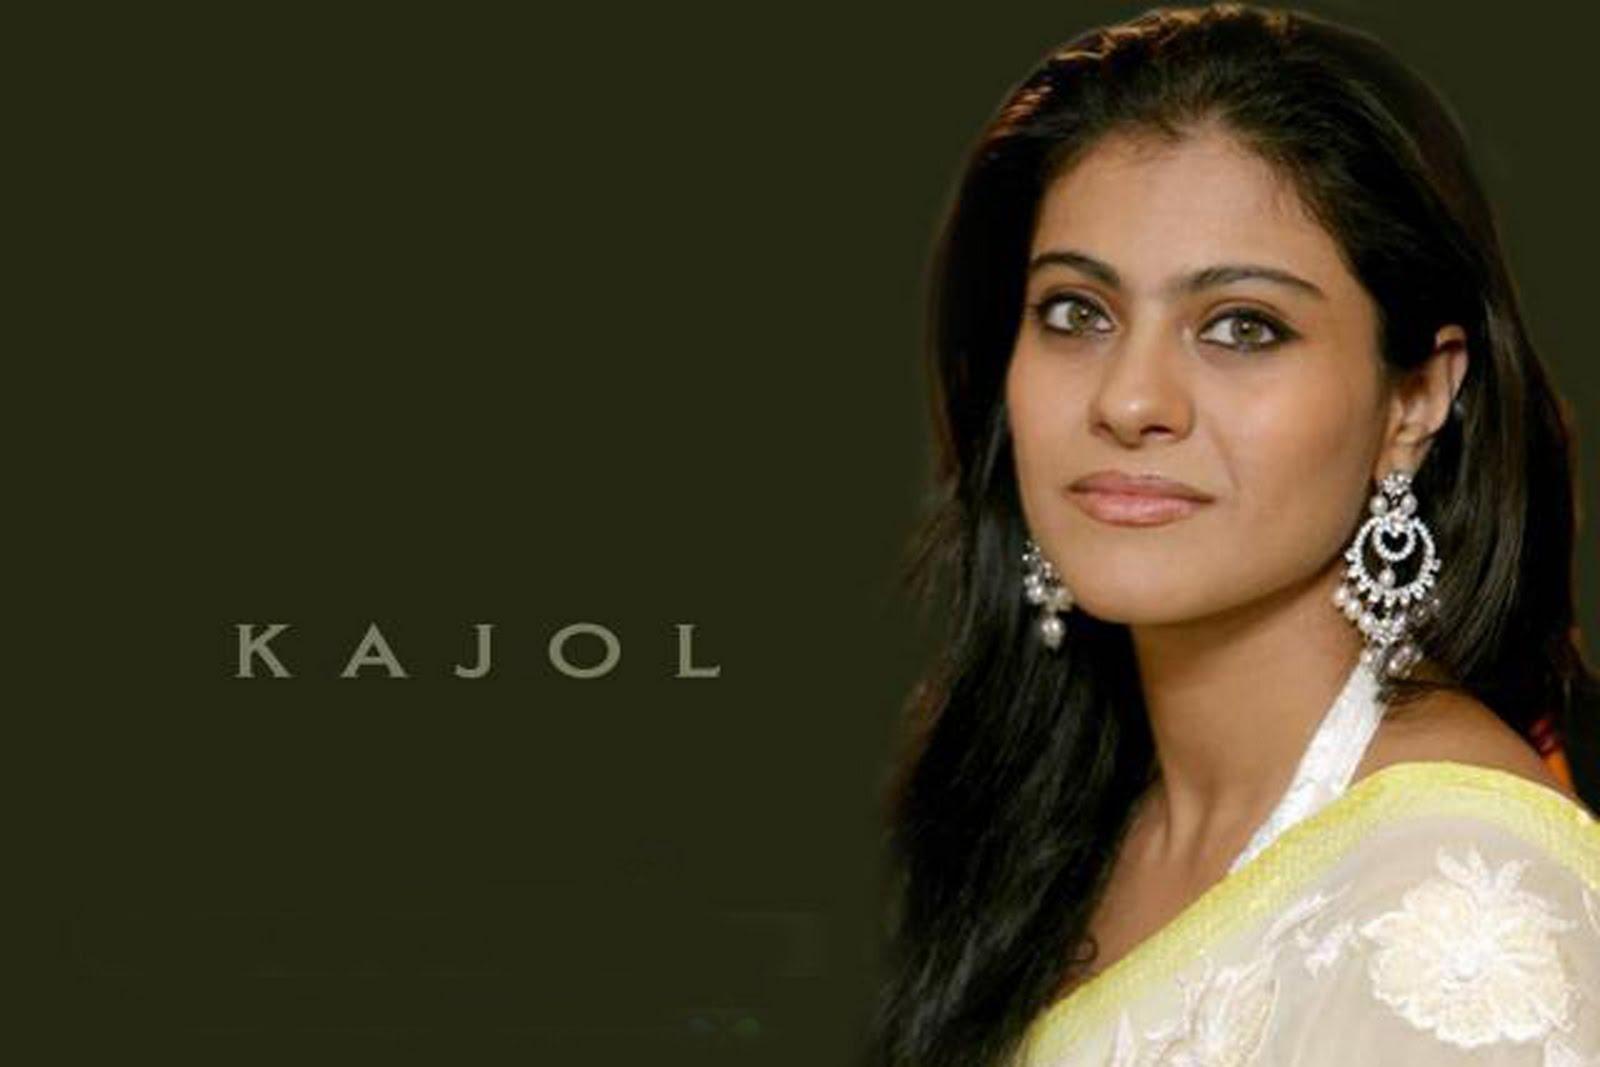 Kajol Bollywood Actress Hot Wallpapers